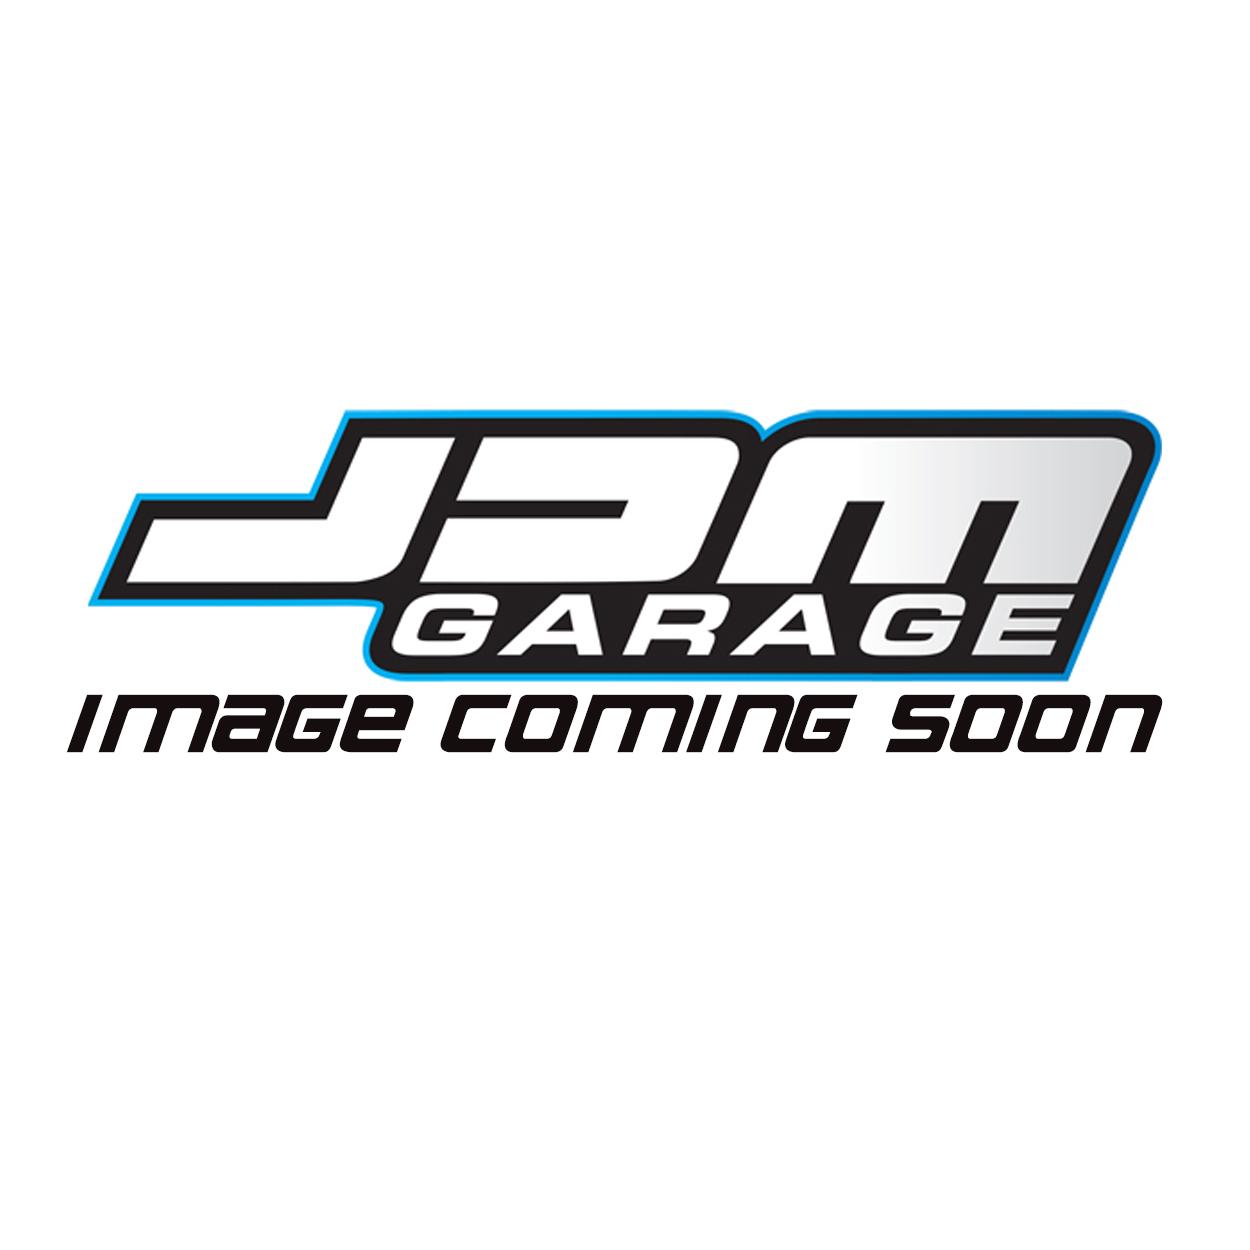 Genuine Toyota Rear Brake Pads for Toyota Supra J29 DB 3.0L 2020 04466-WAA03